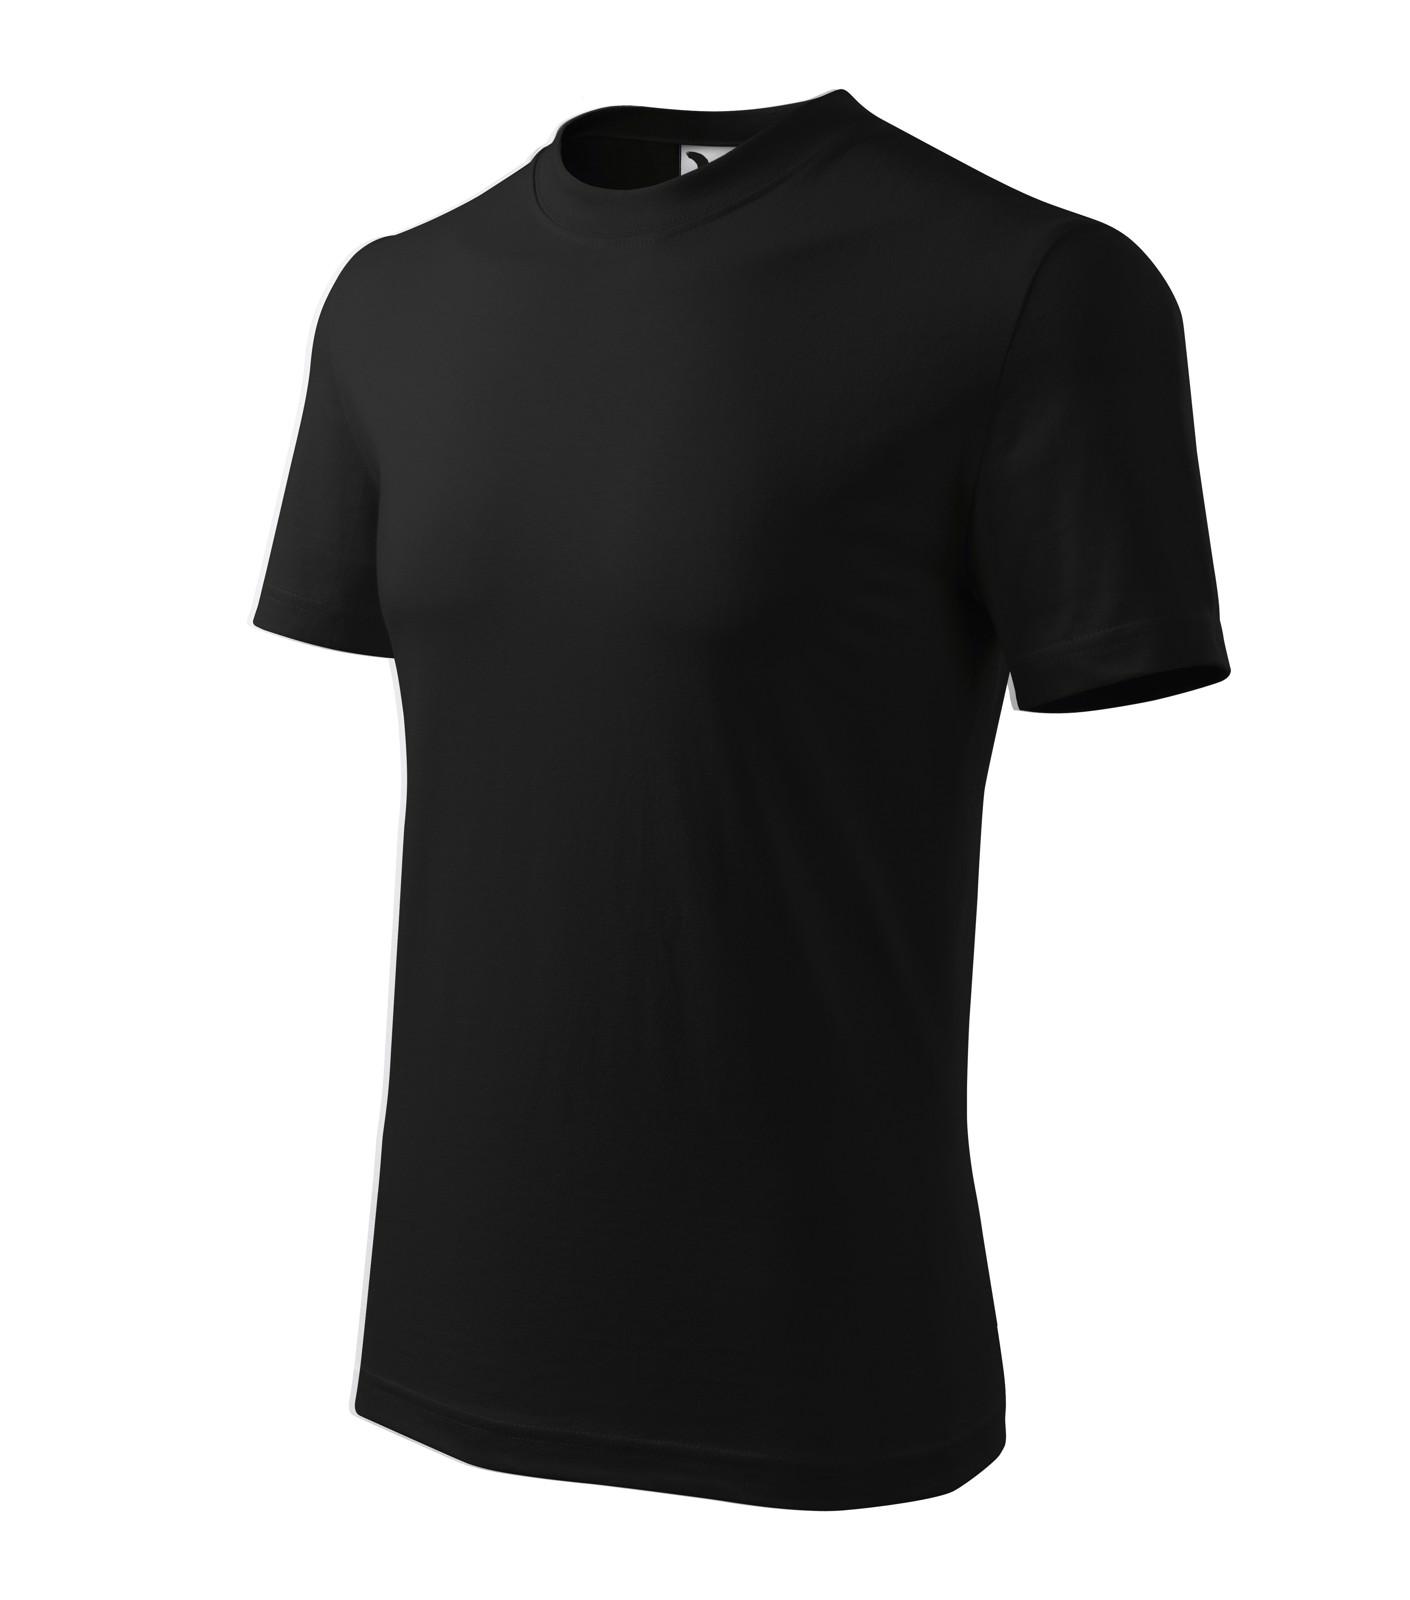 T-shirt unisex Malfini Heavy - Black / M